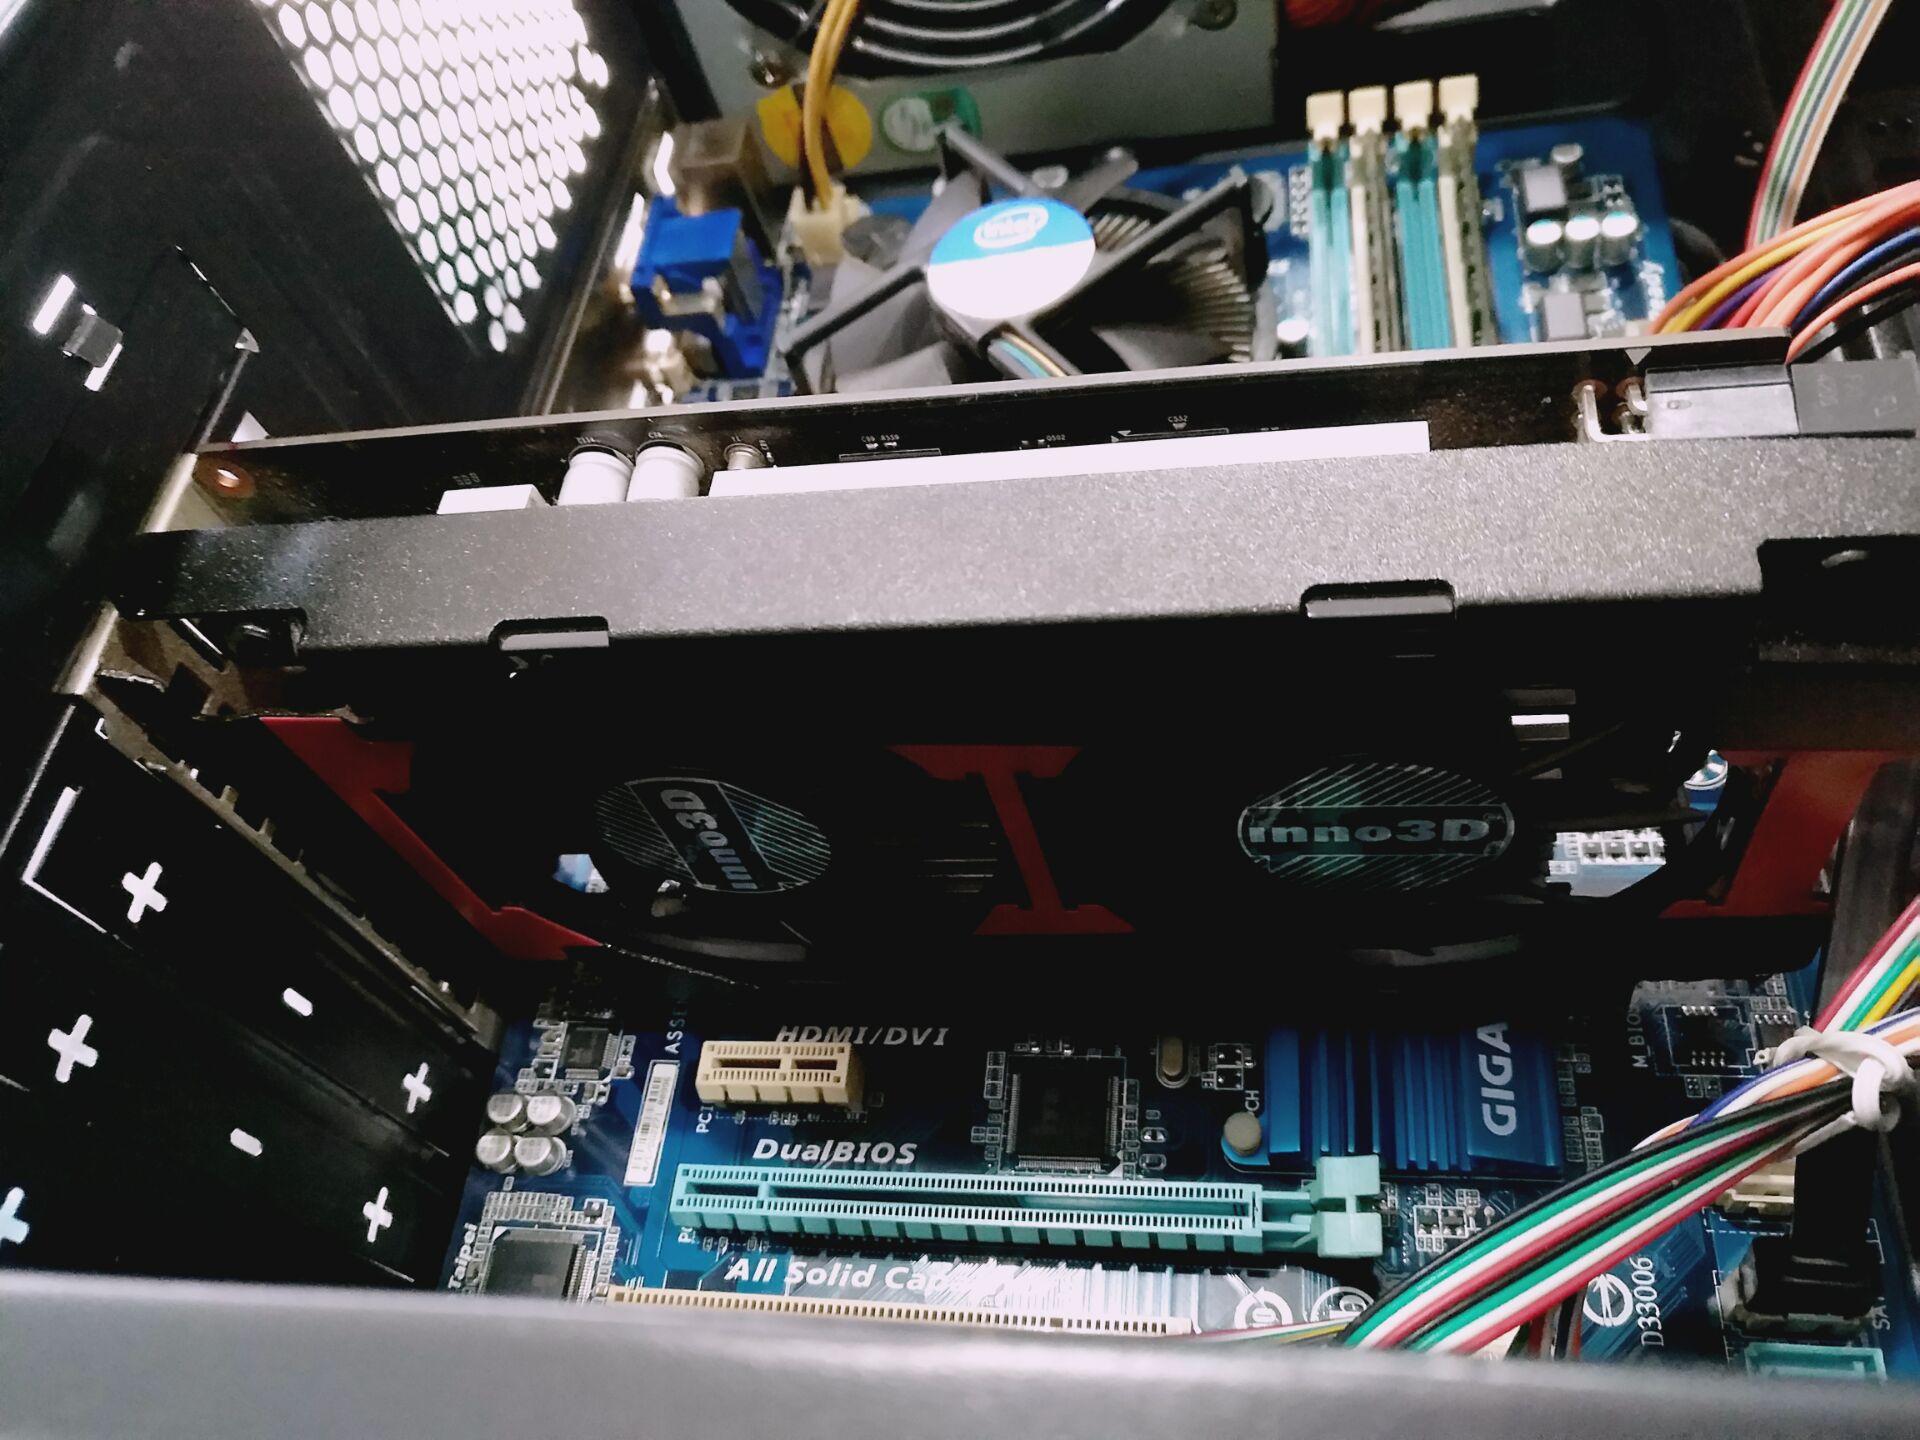 94BC0CBDC8F79AC837D4CD8F48A3D520.jpg